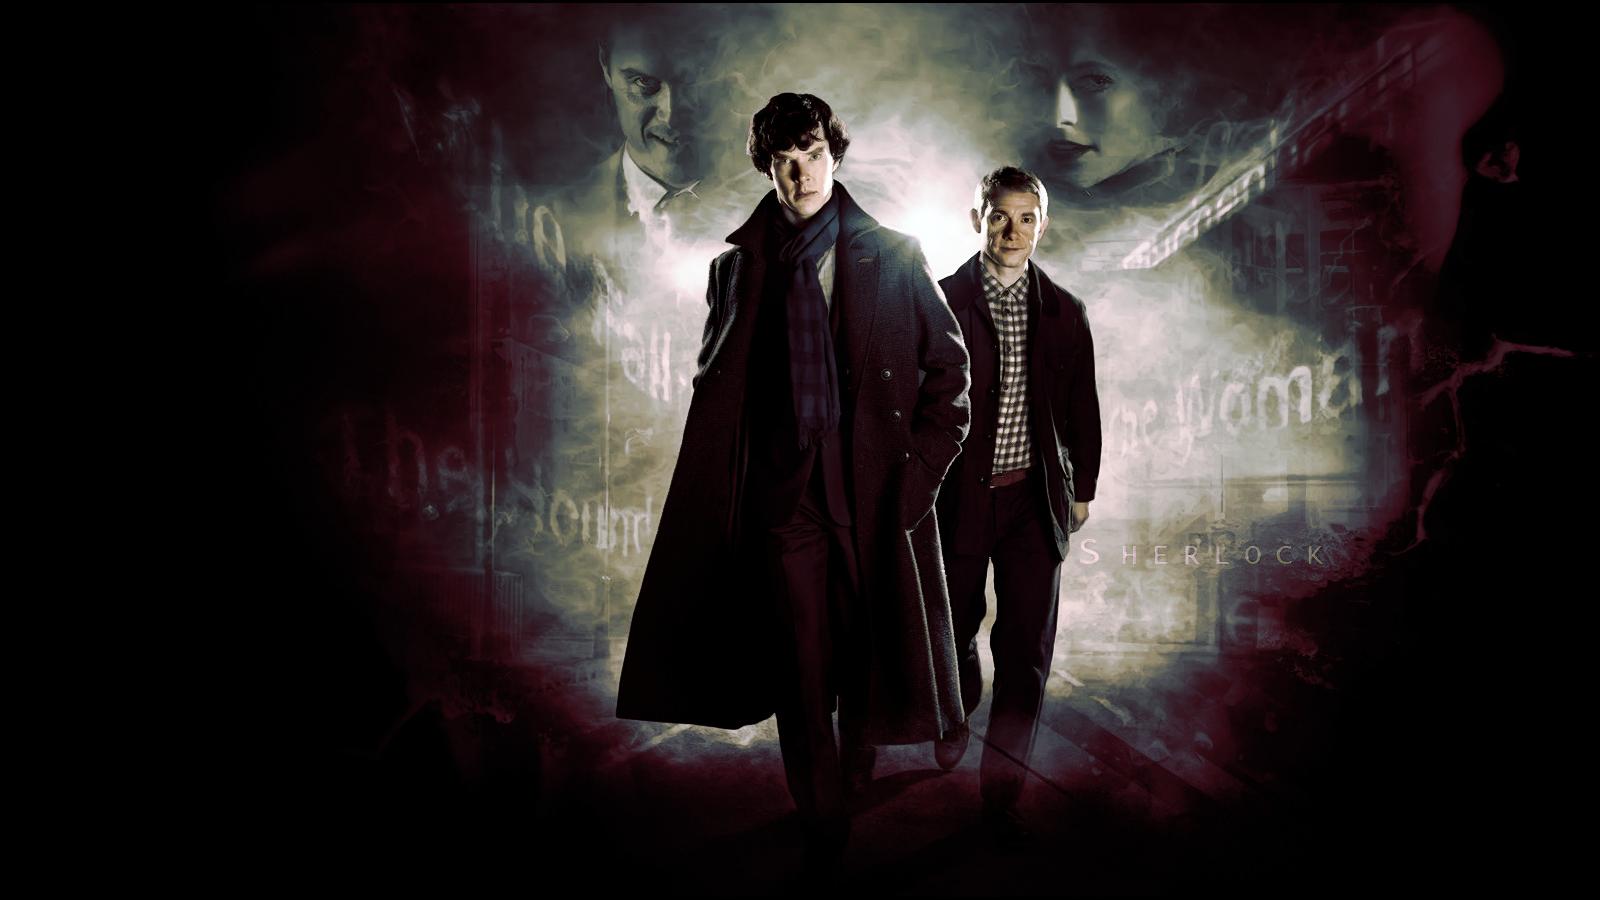 Sherlock Holmes And John Watson By Hobbleit